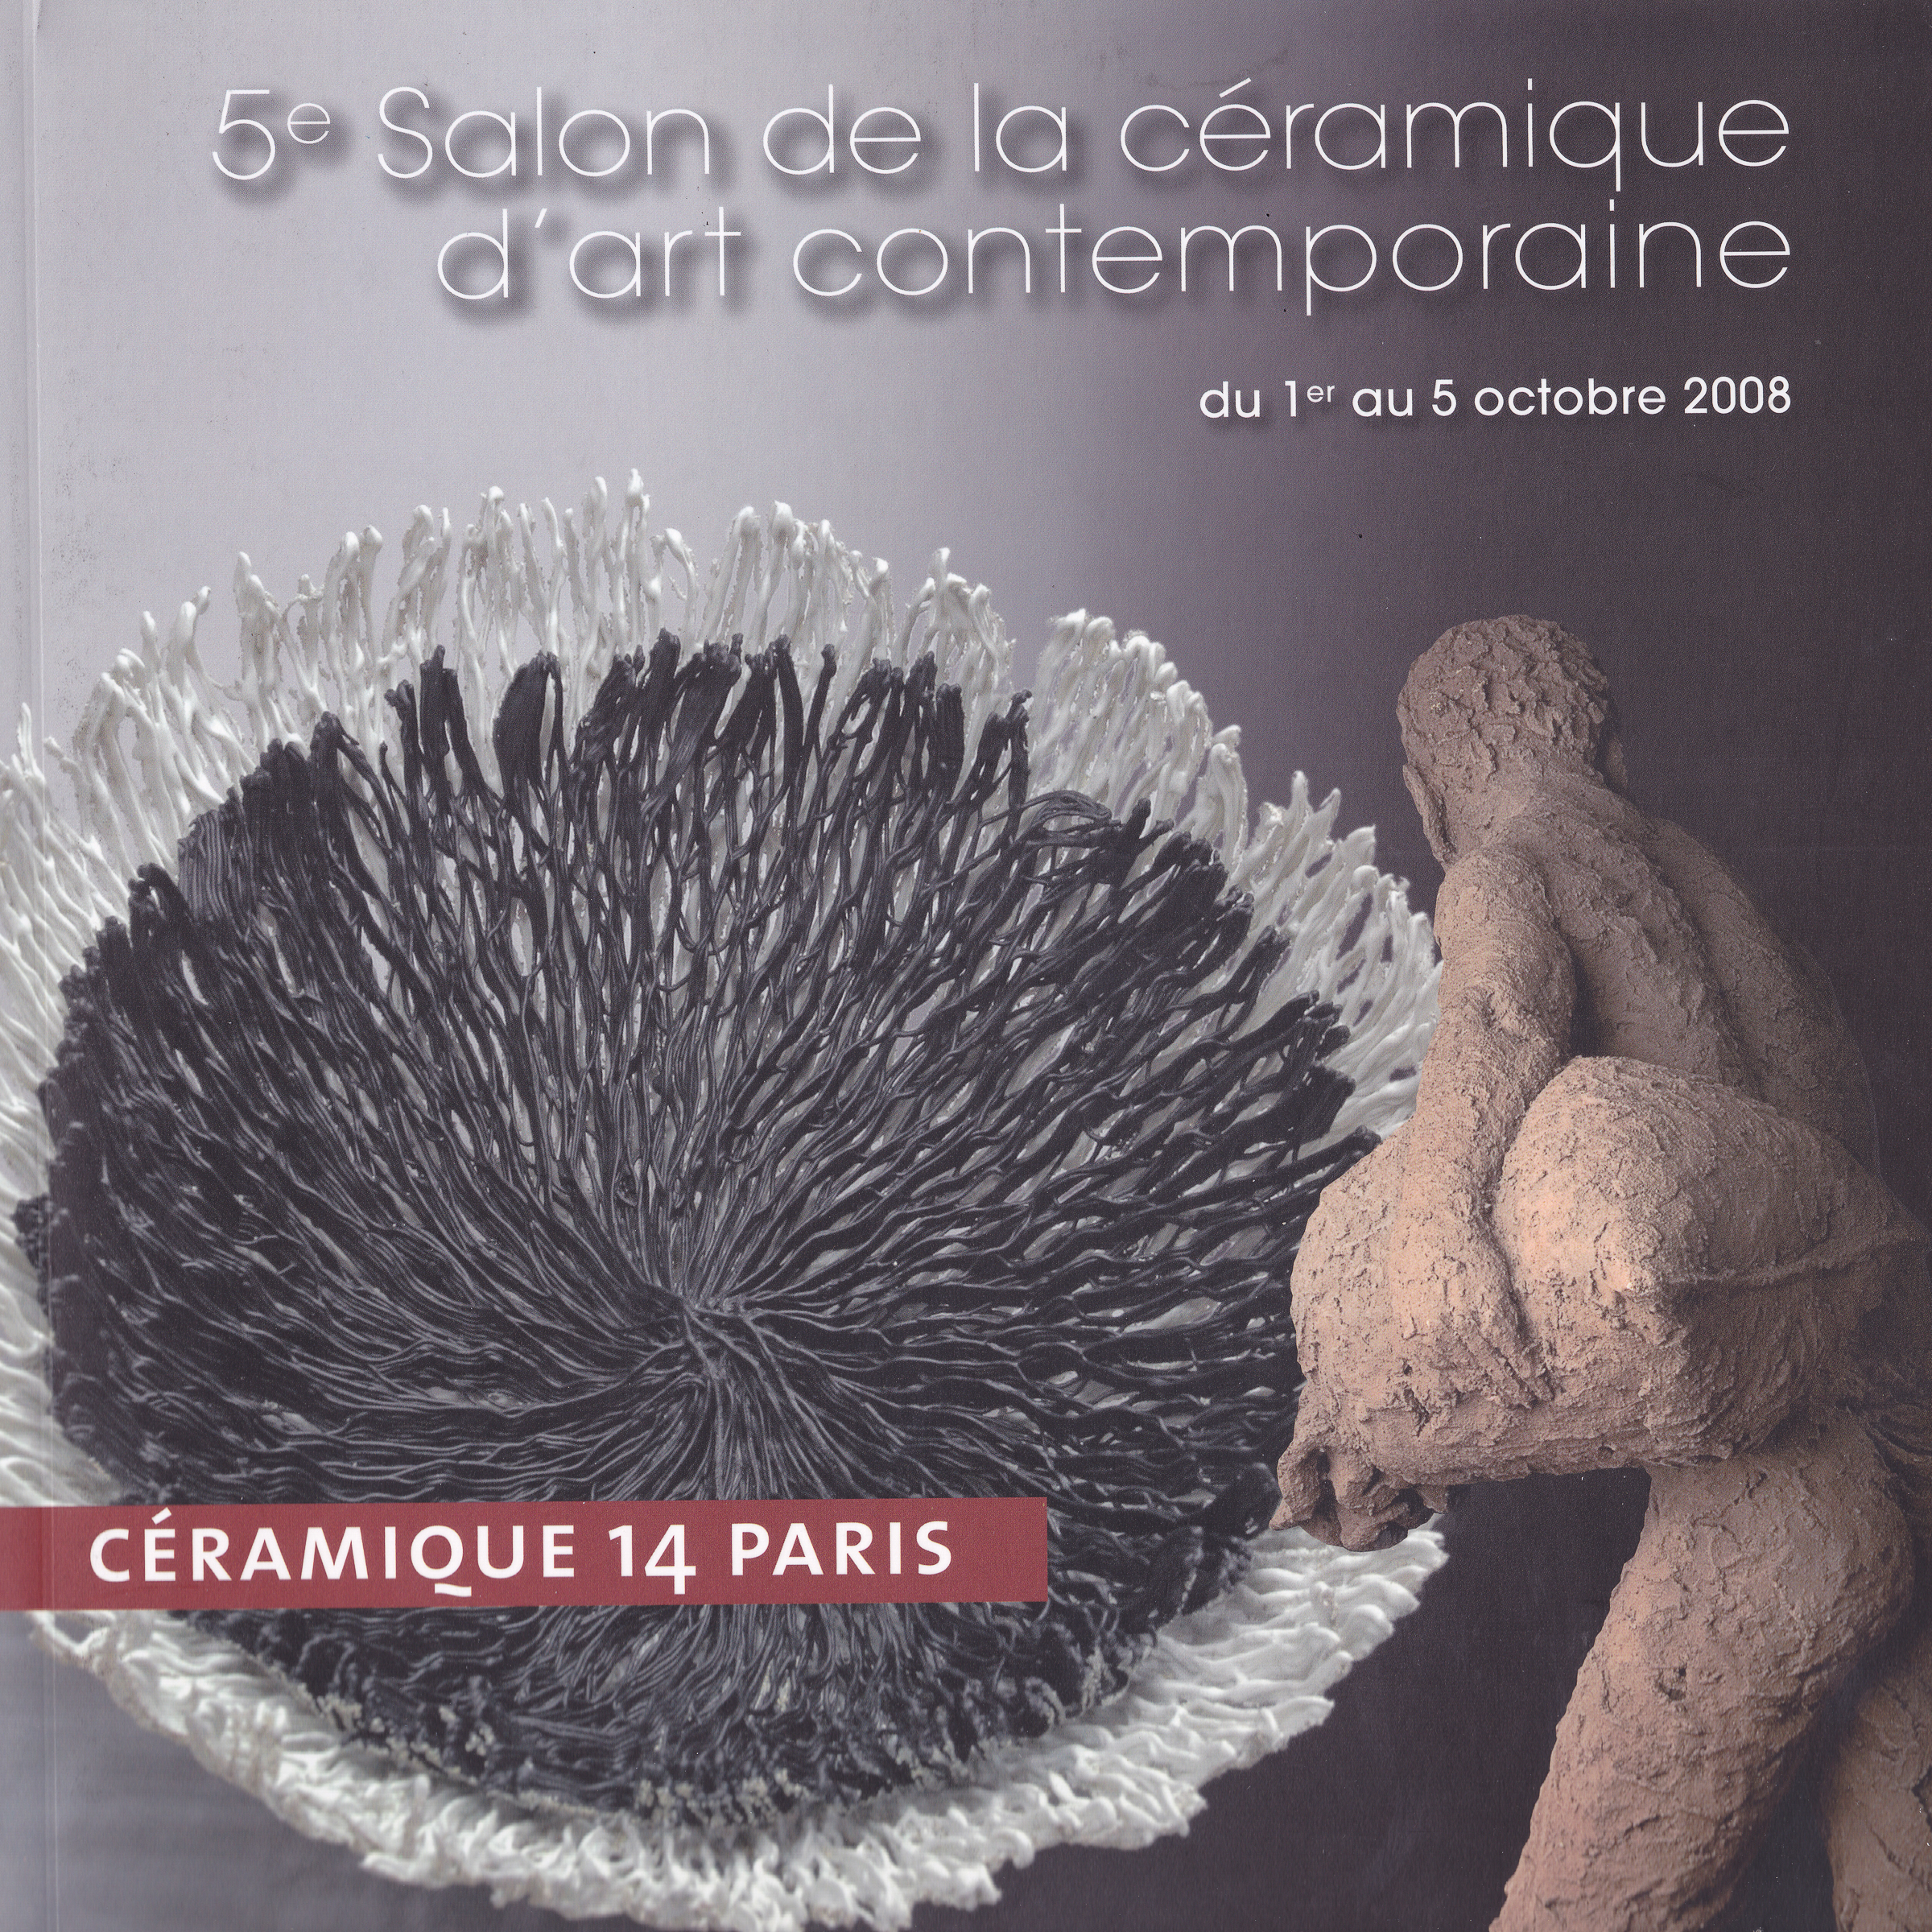 gallery 2008 cer 14 copy-1.jpg